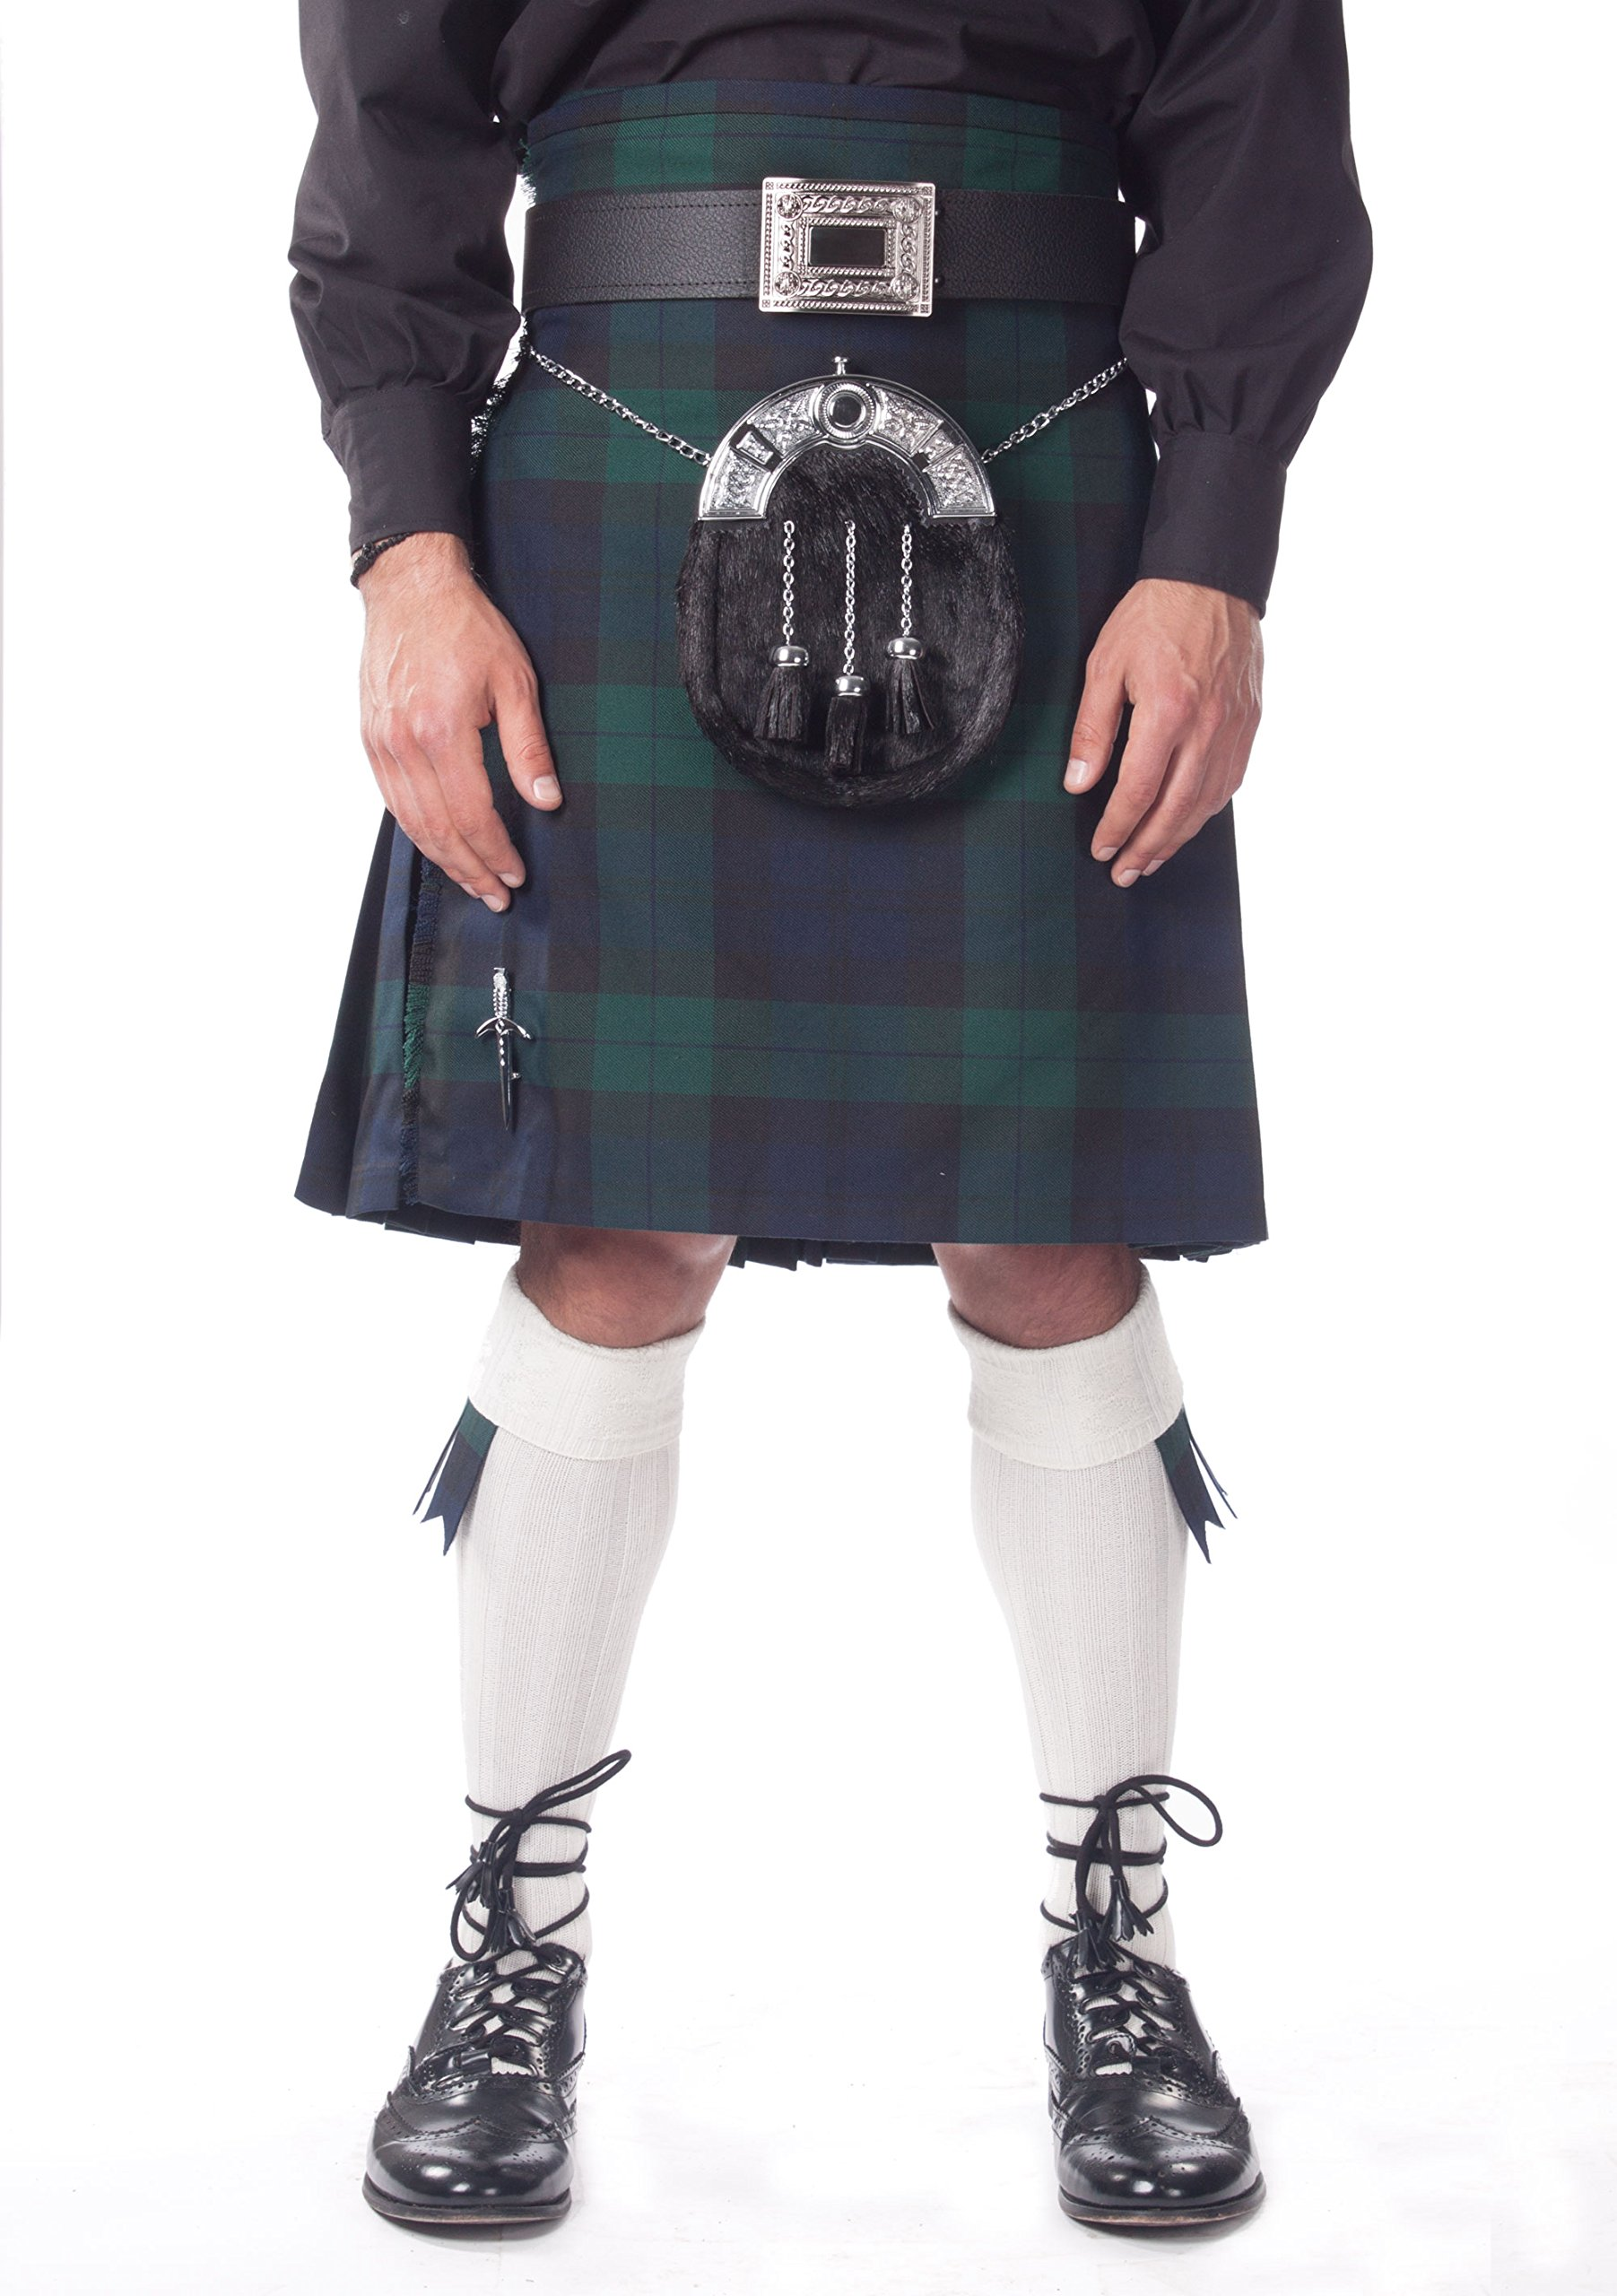 Kilt Society Mens 7 Piece Full Dress Kilt Outfit- Black Watch Tartan with White Hose 38'' to 42''